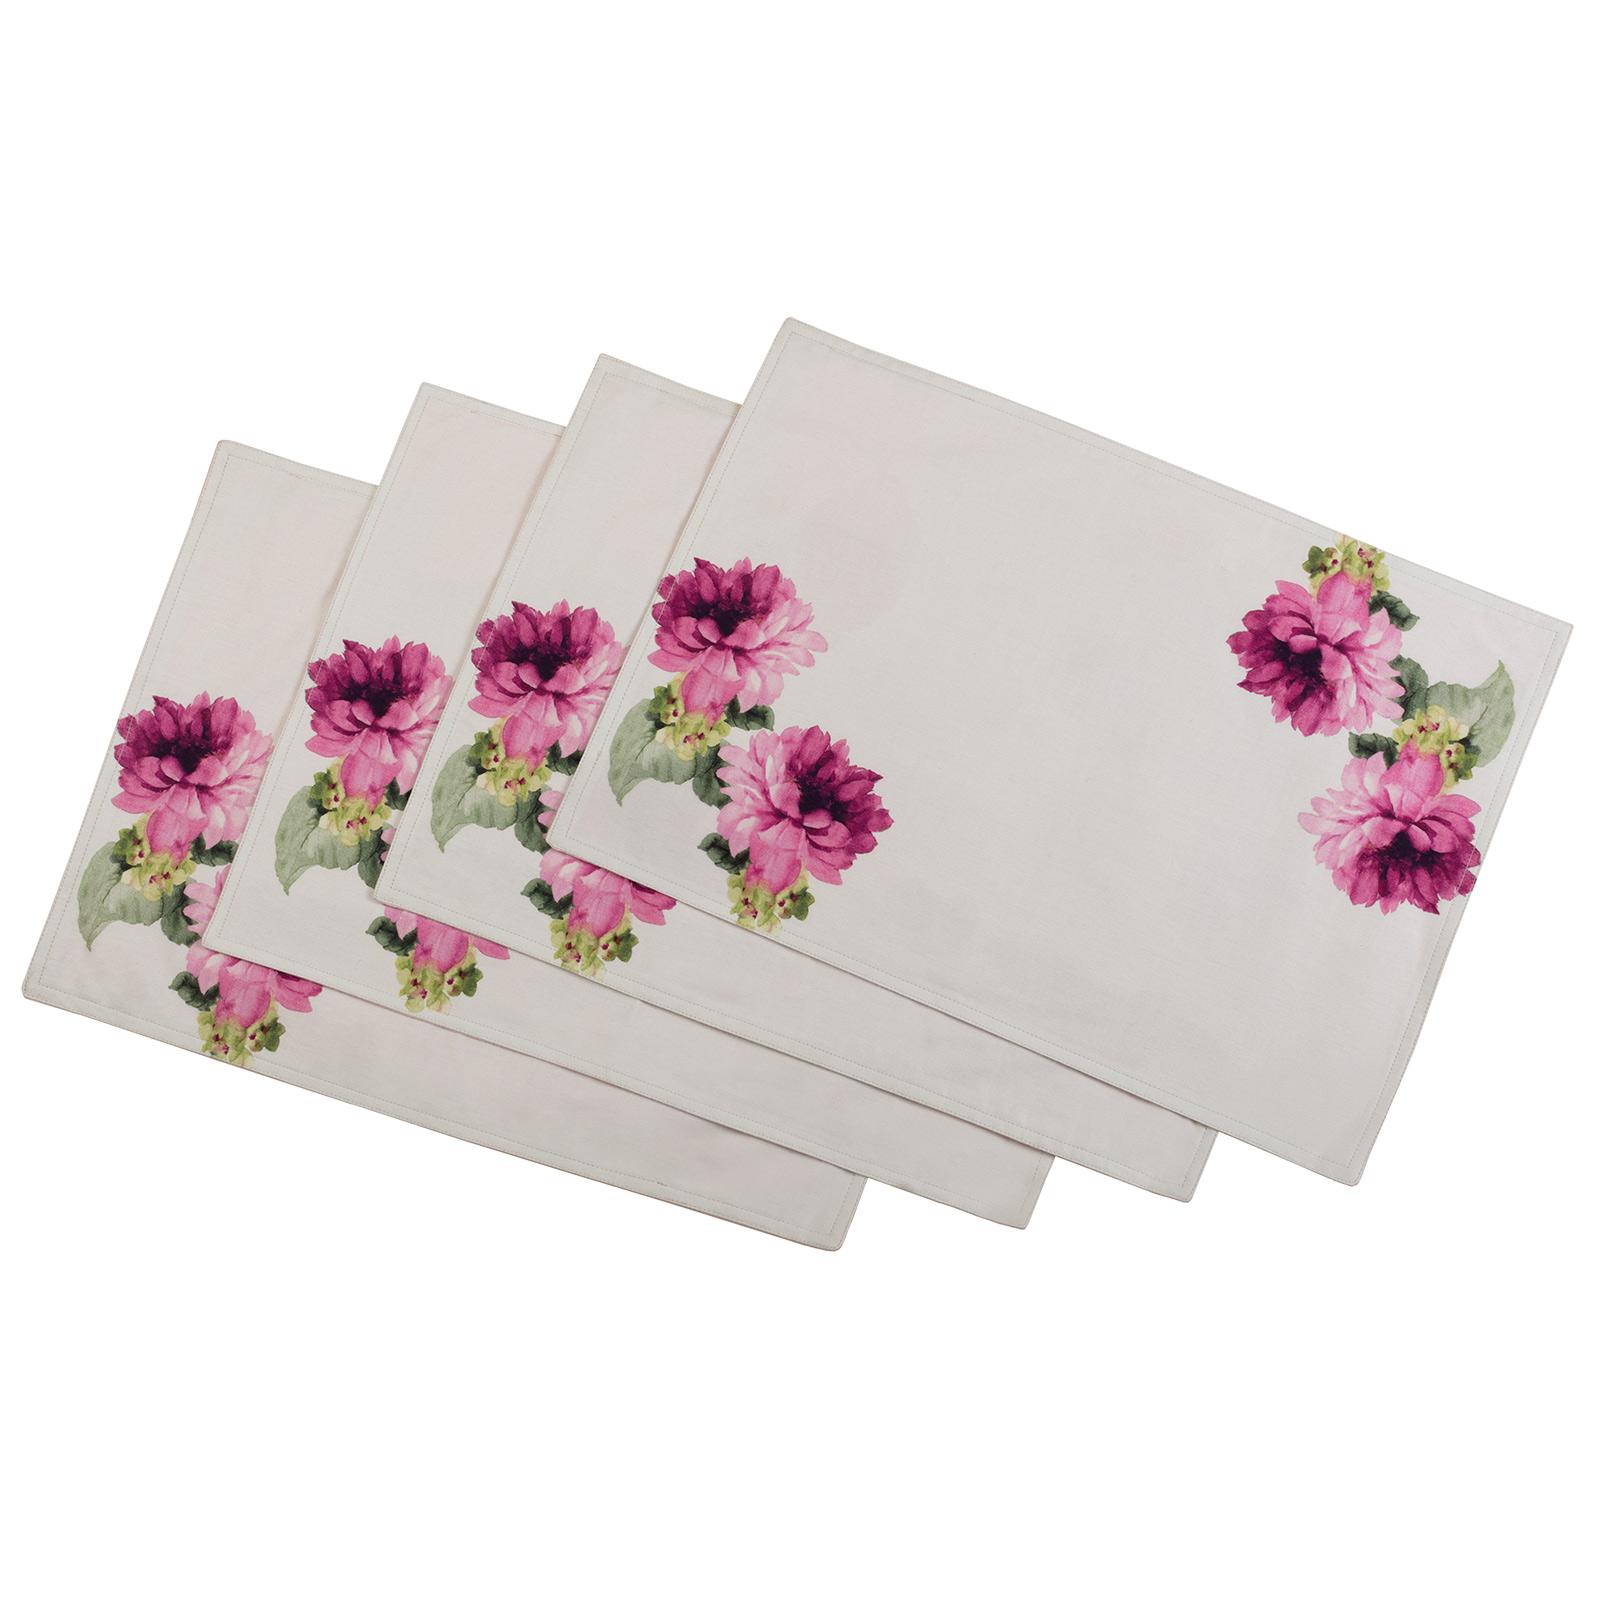 27595 Manteles Individuales Flores De Primavera Home  # Muebles Cadena Flores